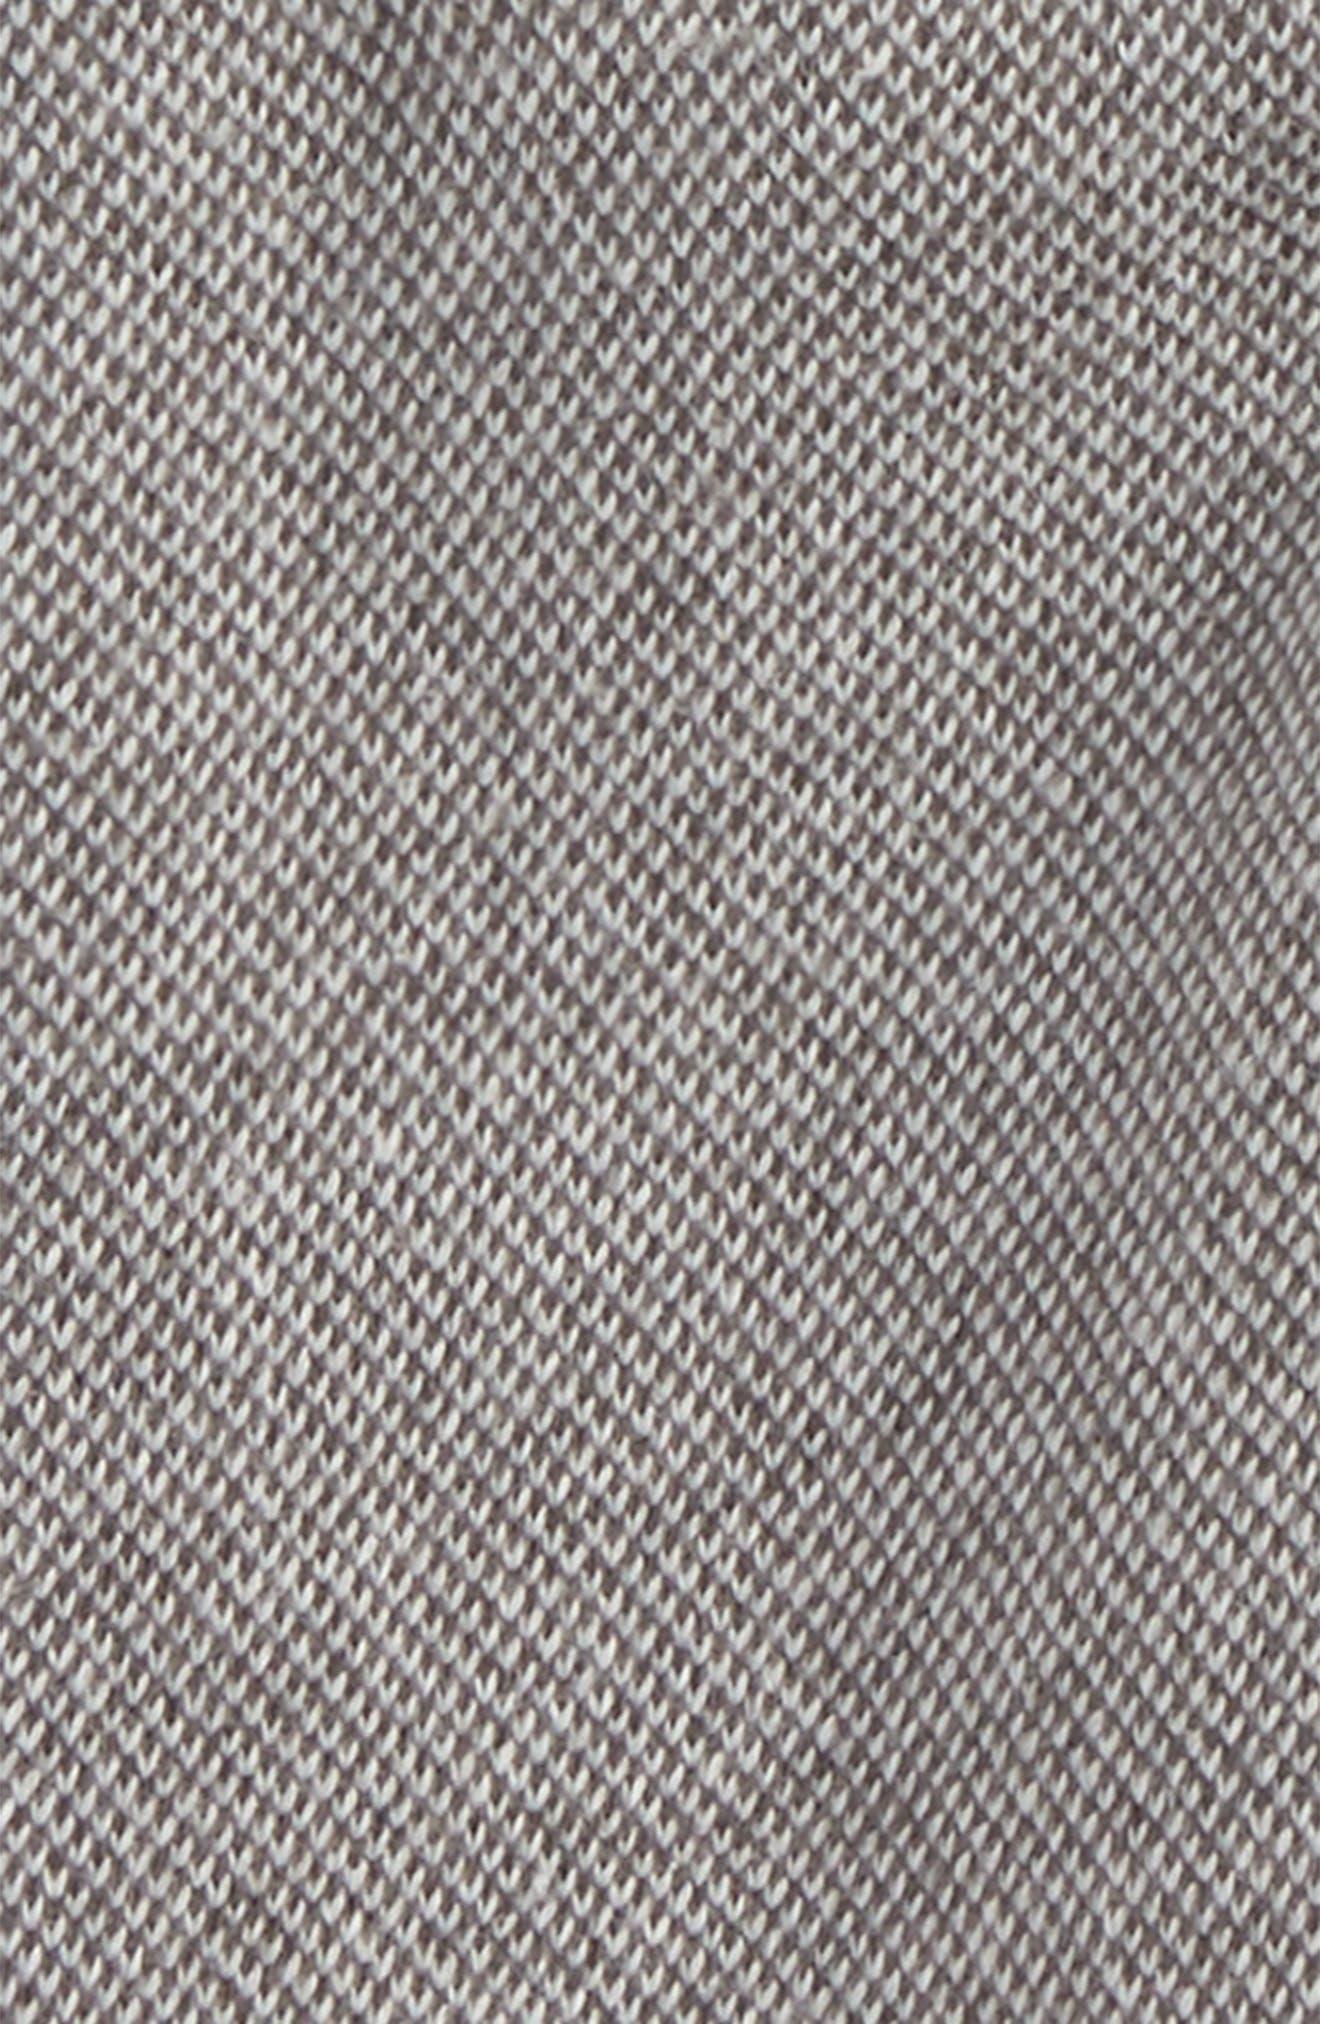 Bird's Eye Jogger Pants,                             Main thumbnail 1, color,                             025